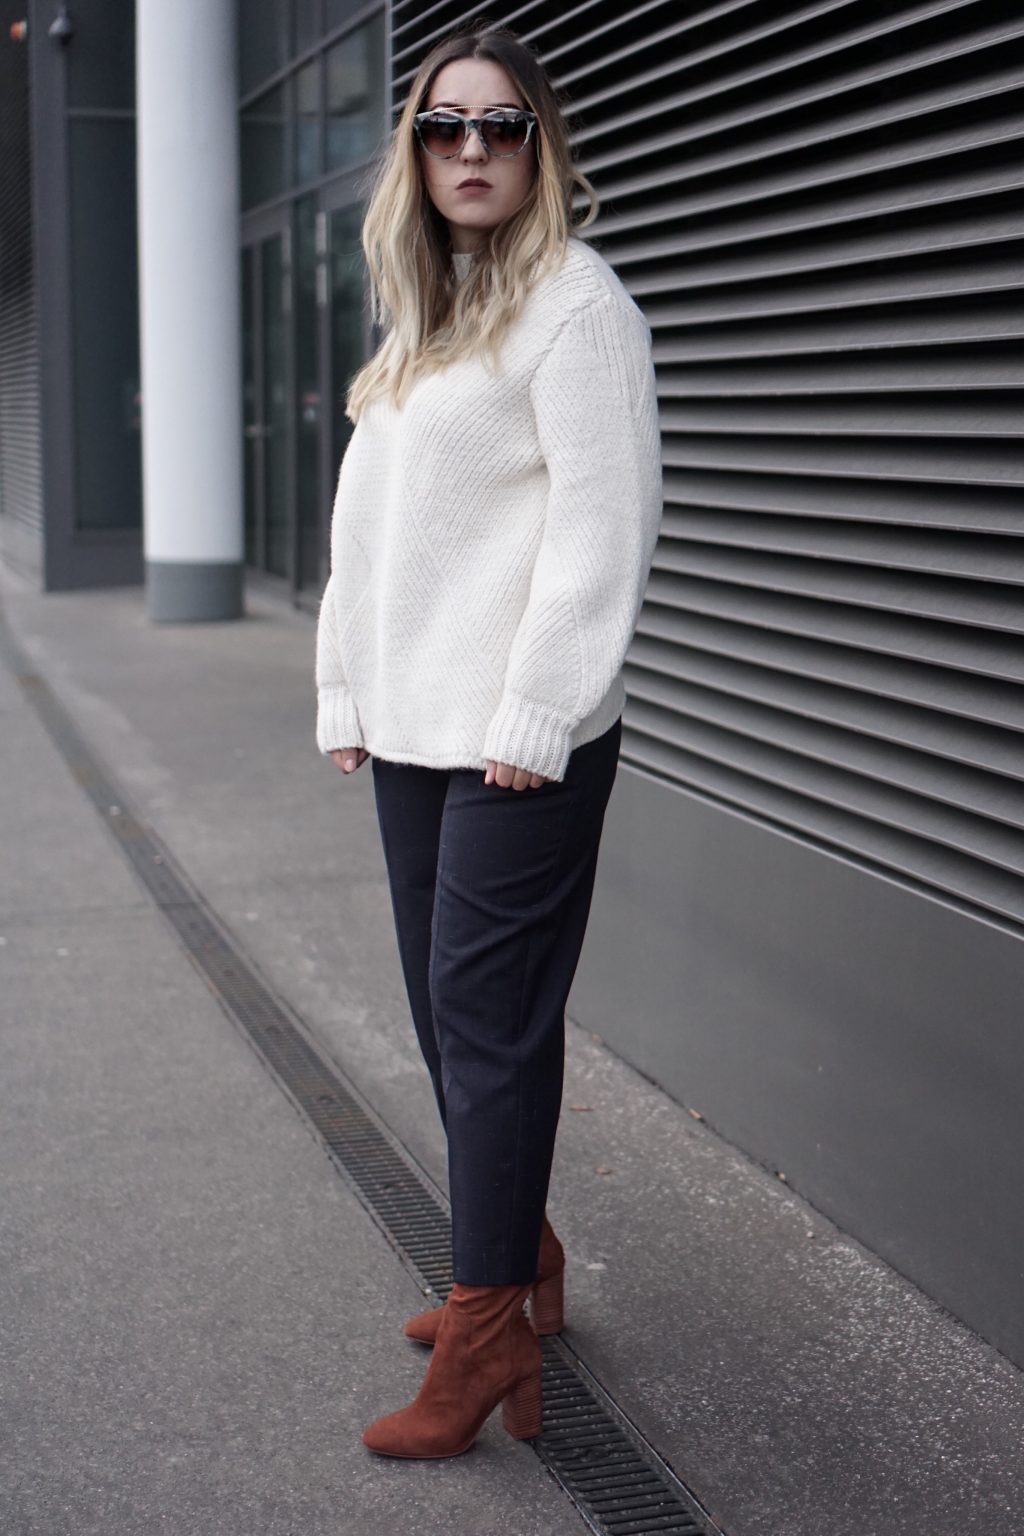 A simple outfit idea